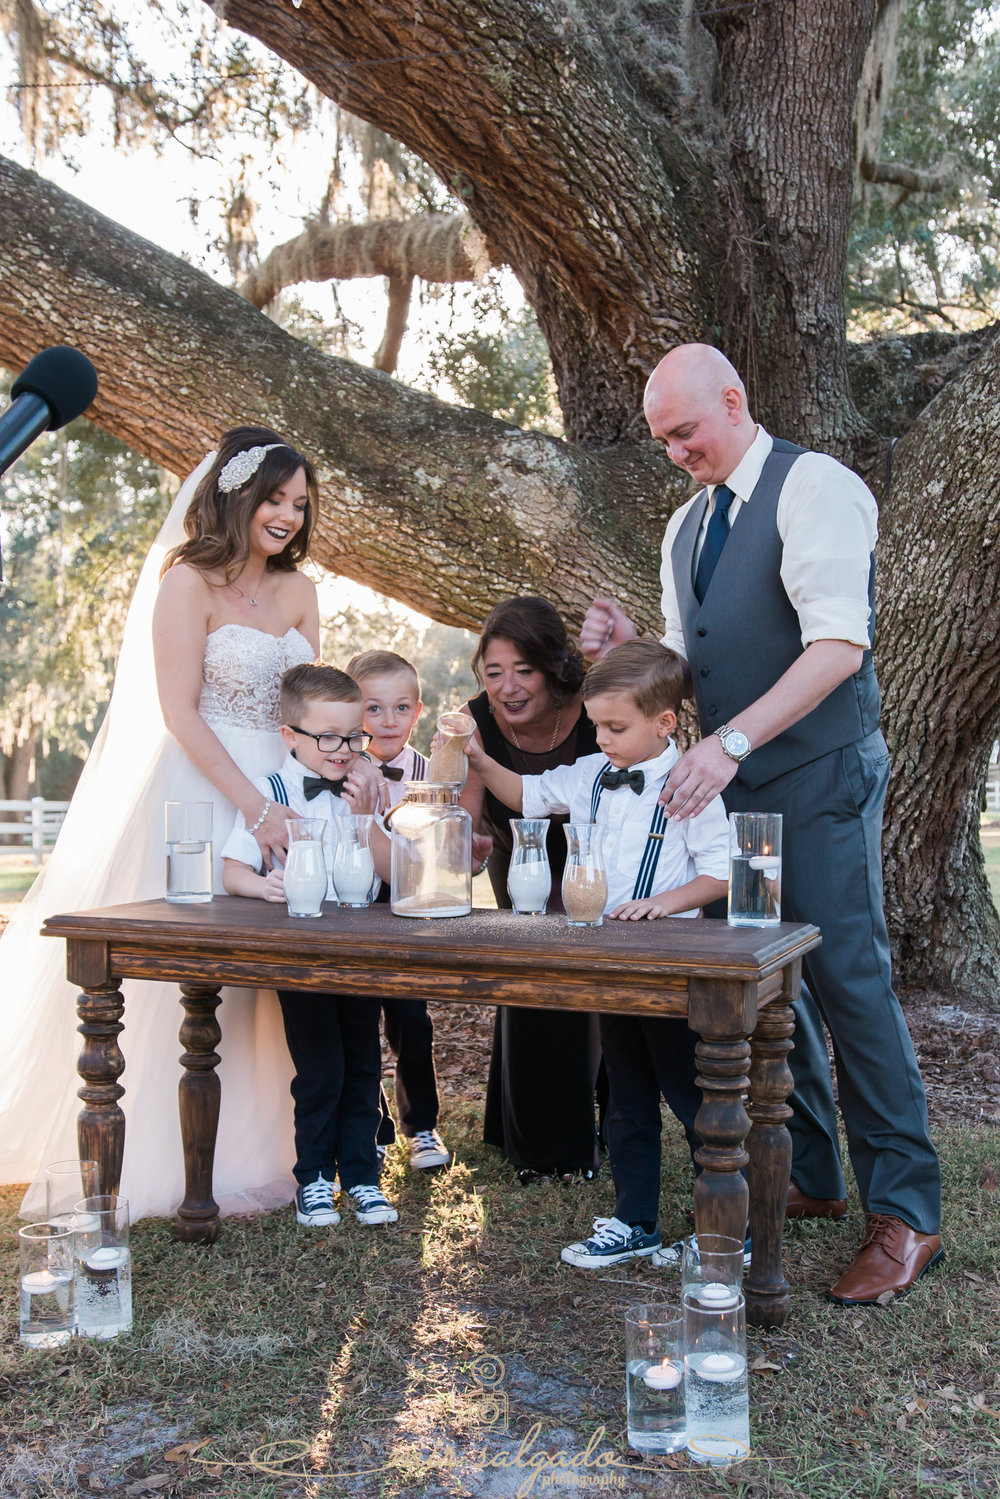 The-Lange-Farm-wedding-ceremony, Tampa-wedding-ceremony, Tampa-wedidng